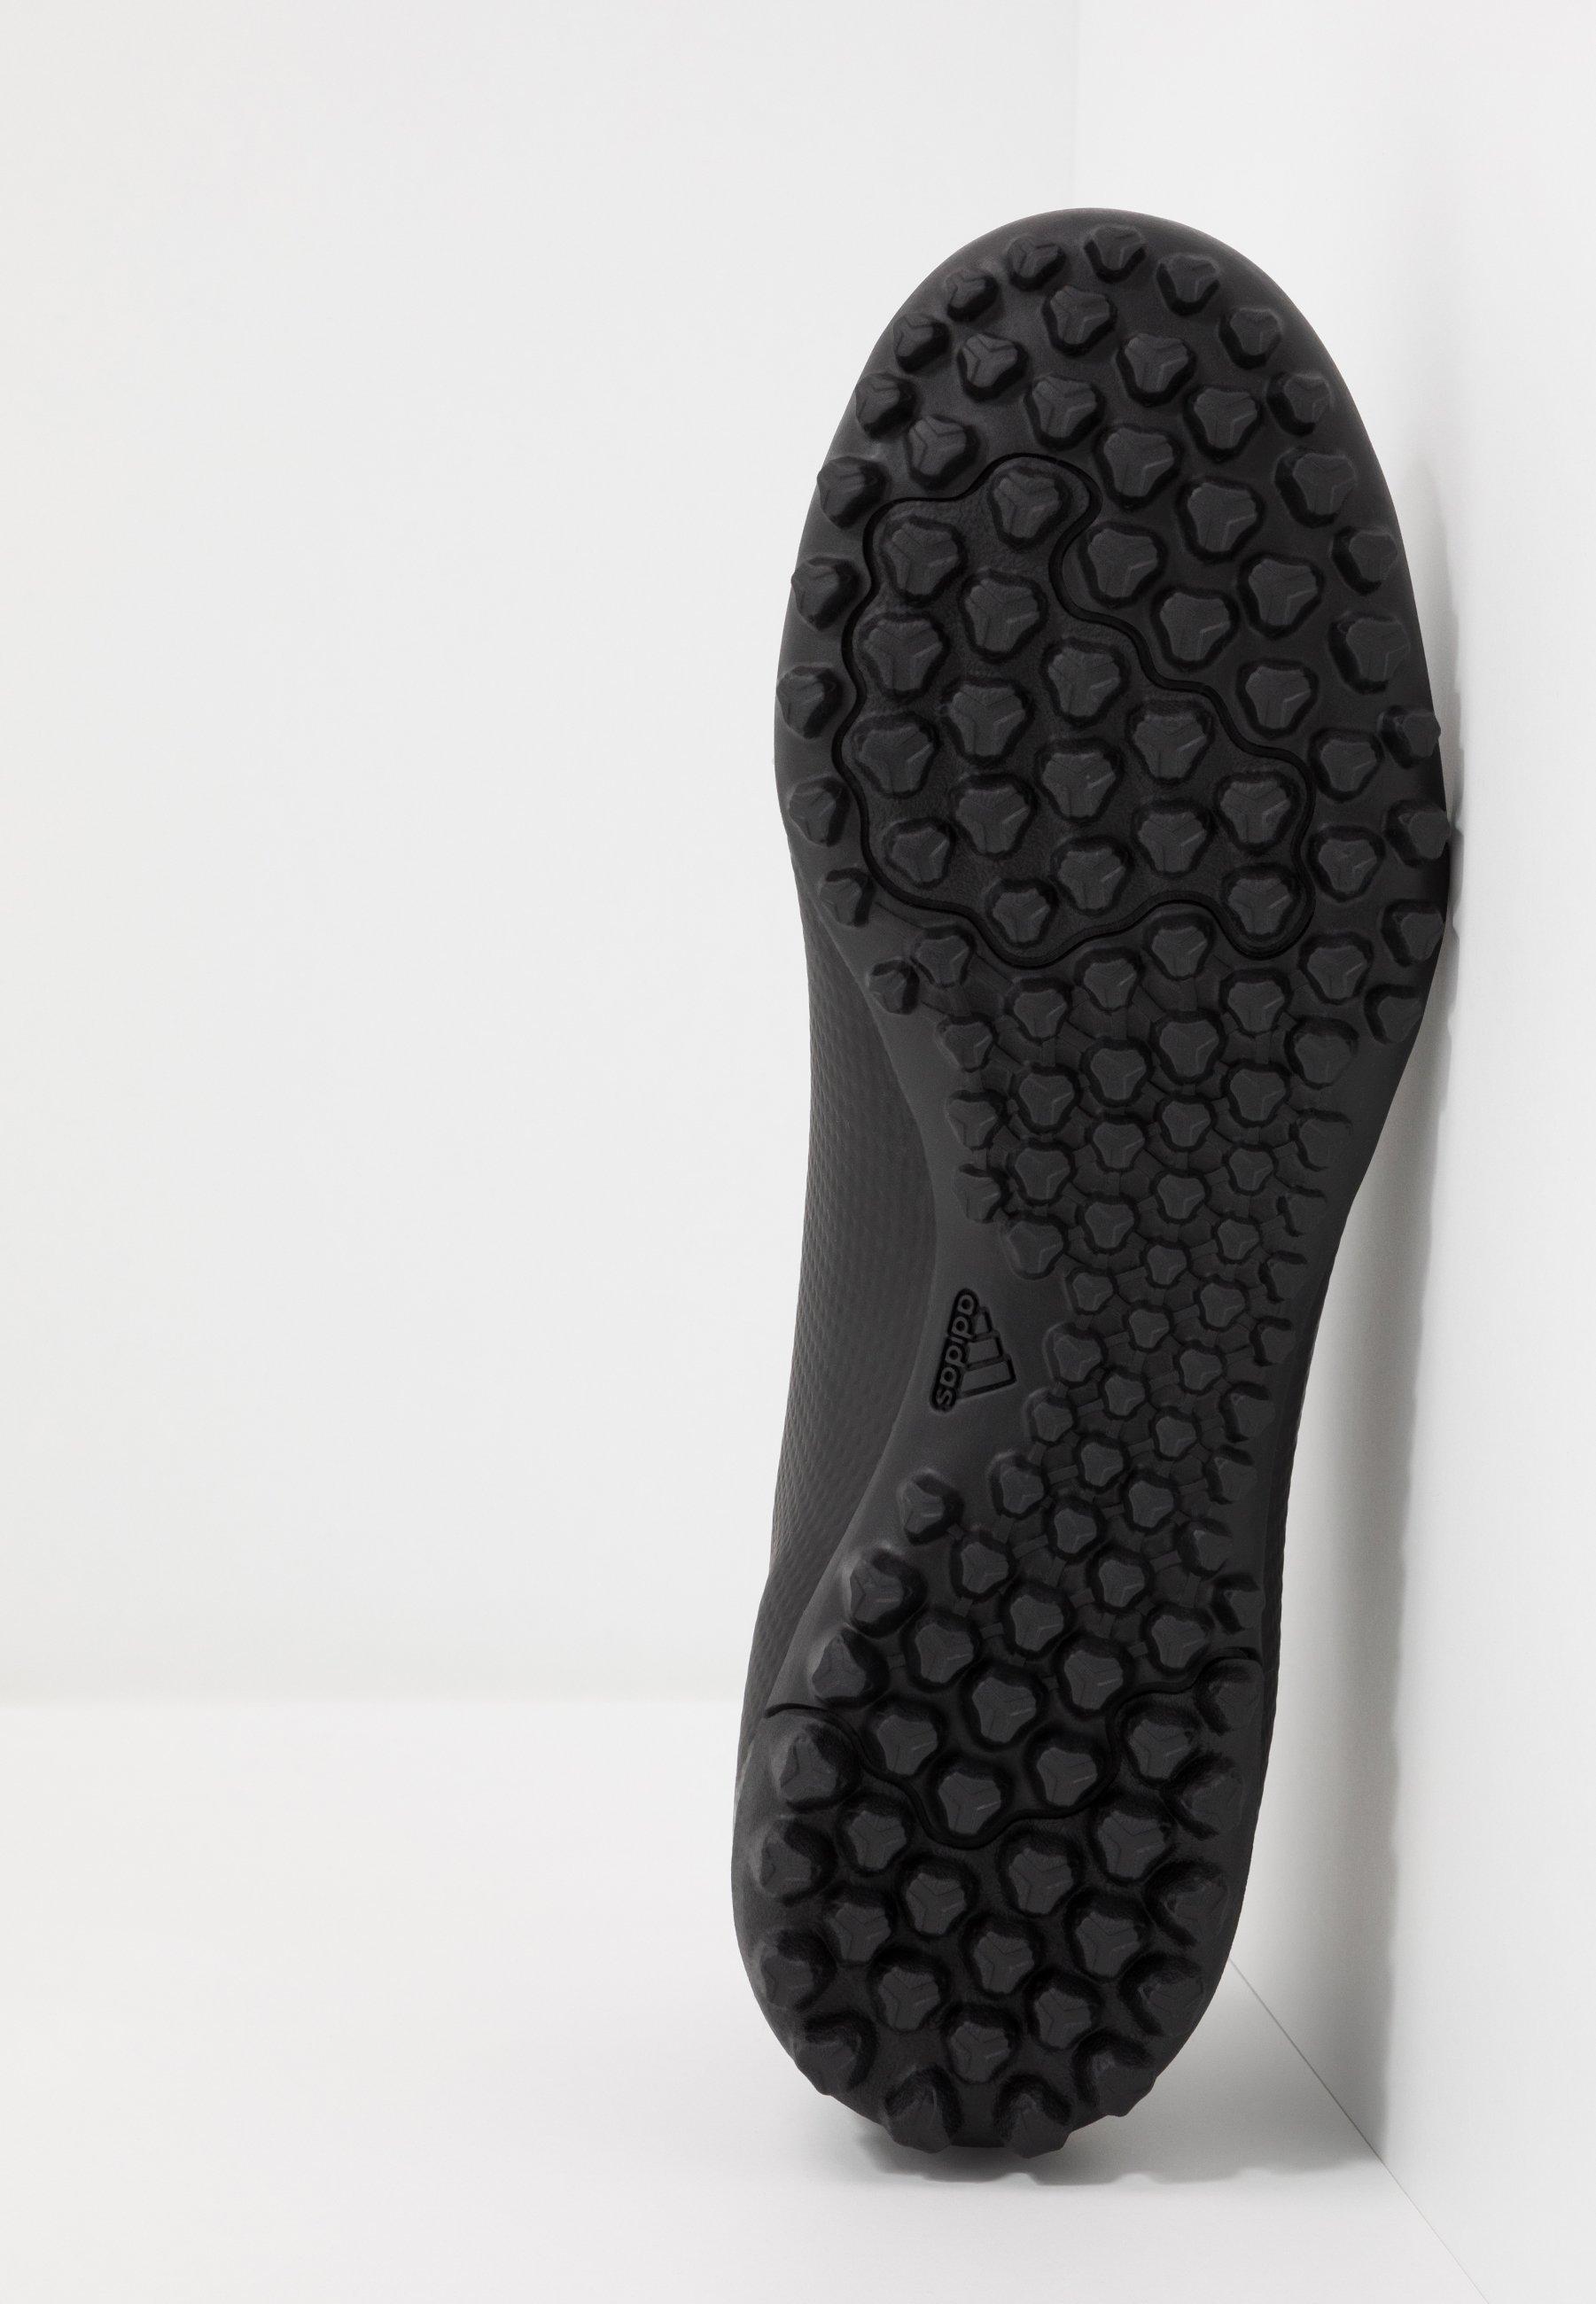 Rabat Bulk Designs Herresko adidas Performance PREDATOR 20.4 TF Fodboldstøvler m/ multi knobber core black/dough solid grey DwHJ37 3nbXet